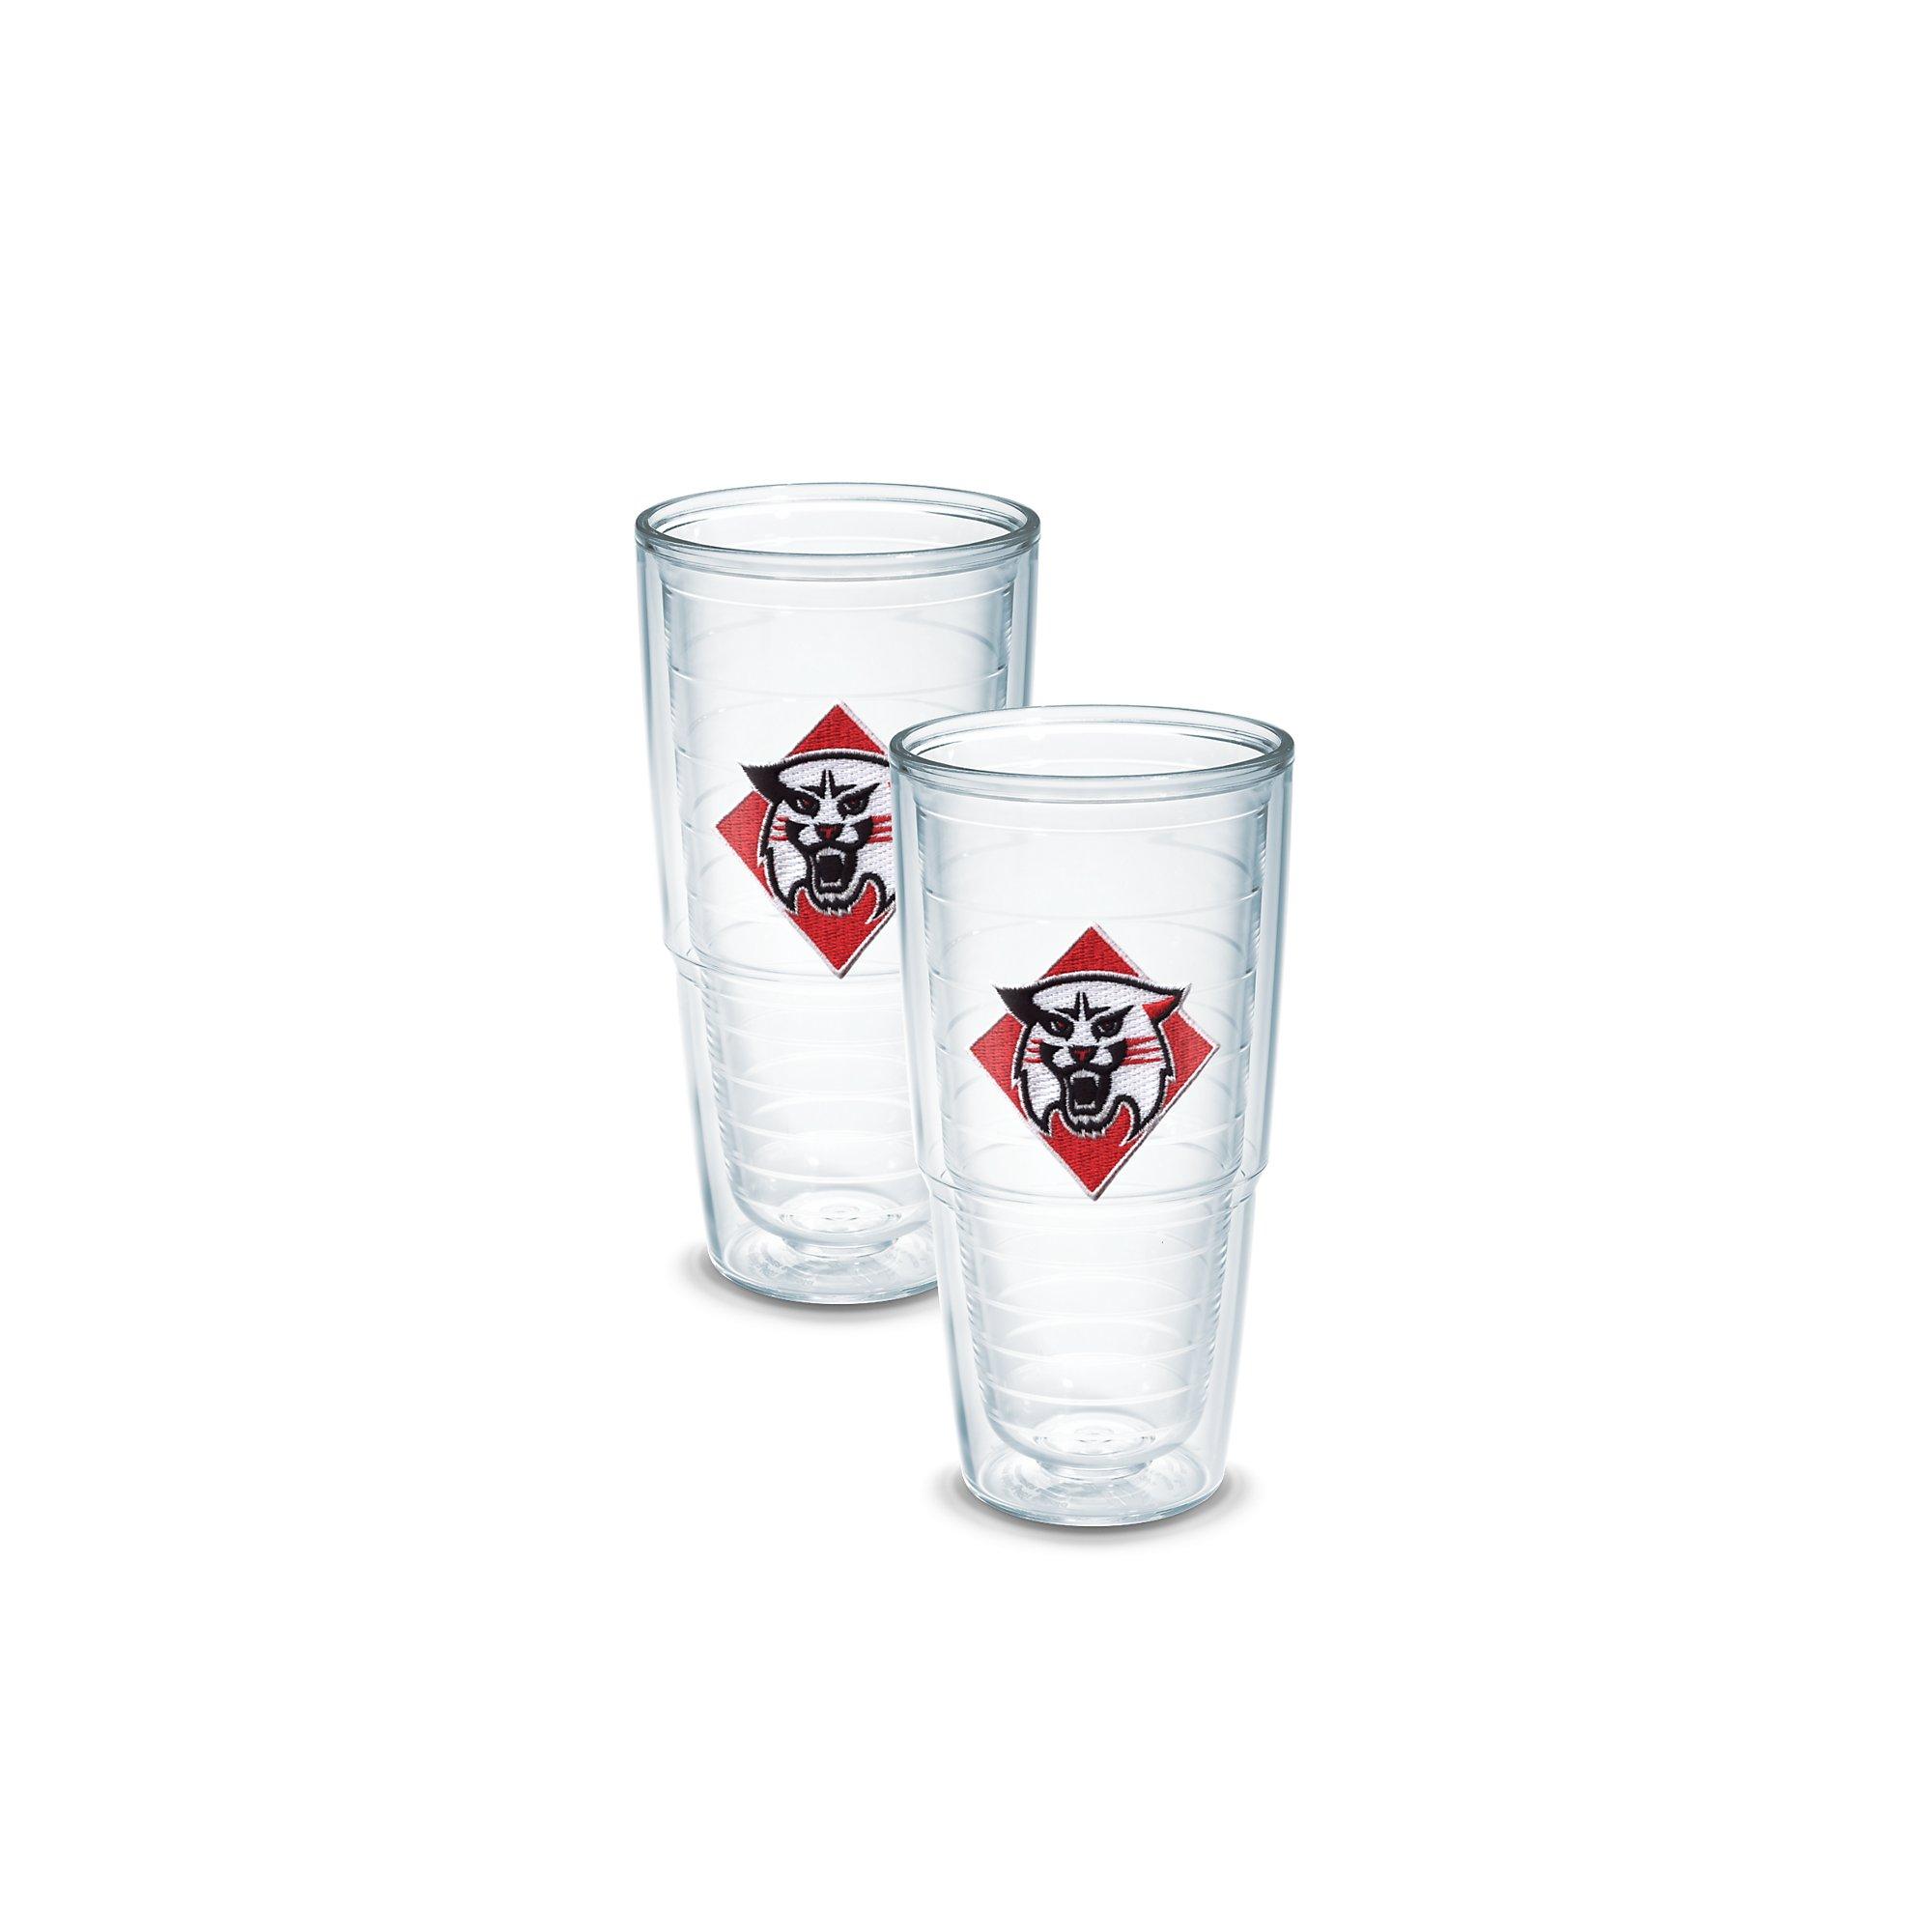 Tervis 1049913 Davidson College Emblem Tumbler, Set of 2, 24 oz, Clear